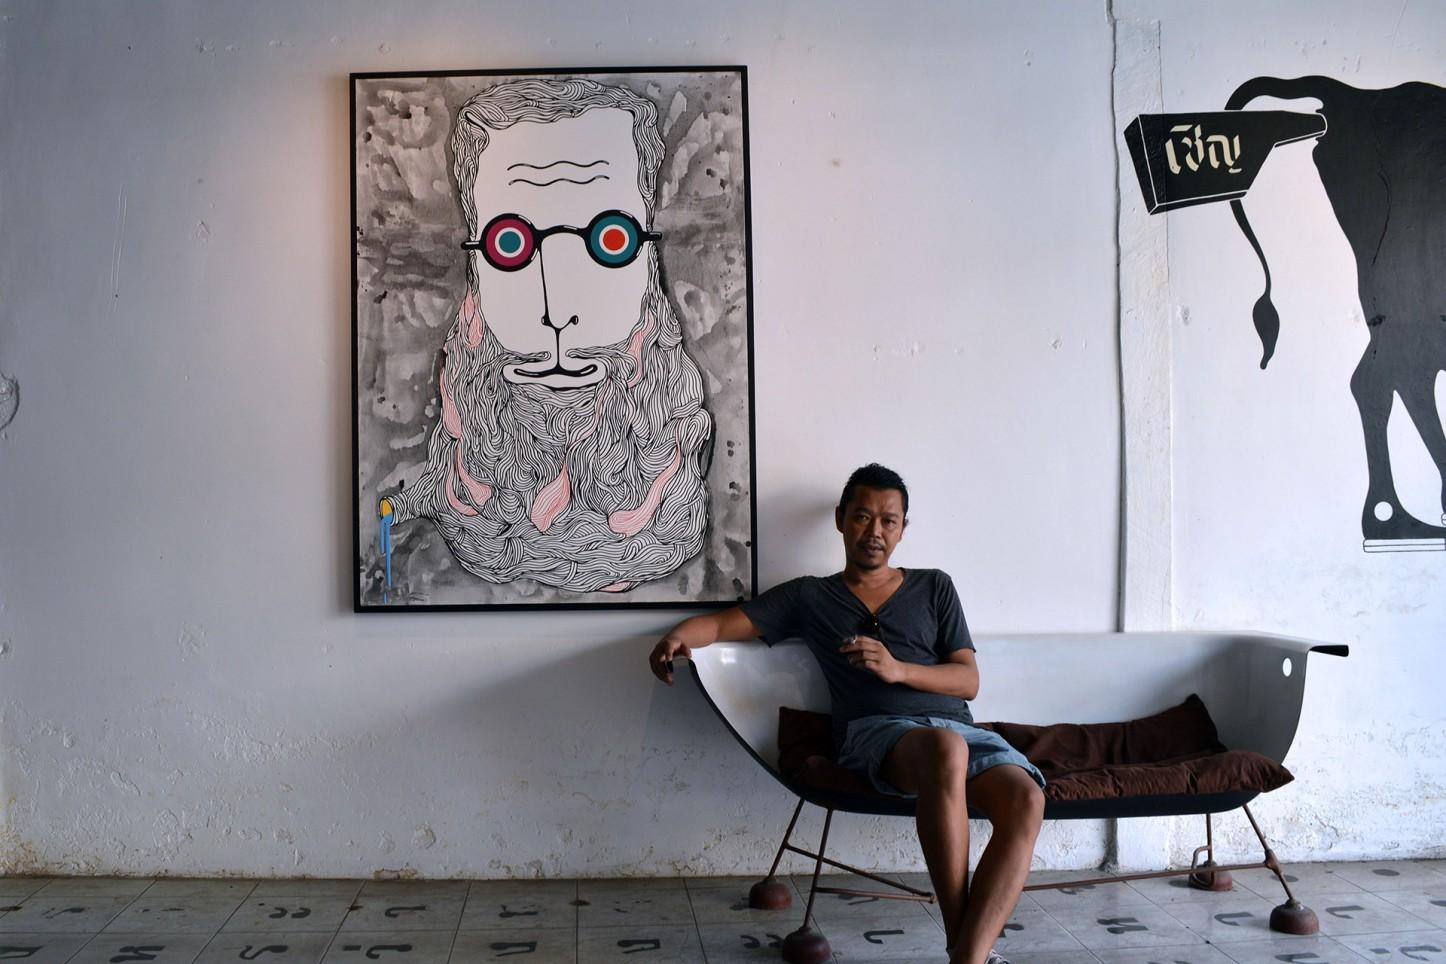 Wua Art Gallery, Phuket, Thailand